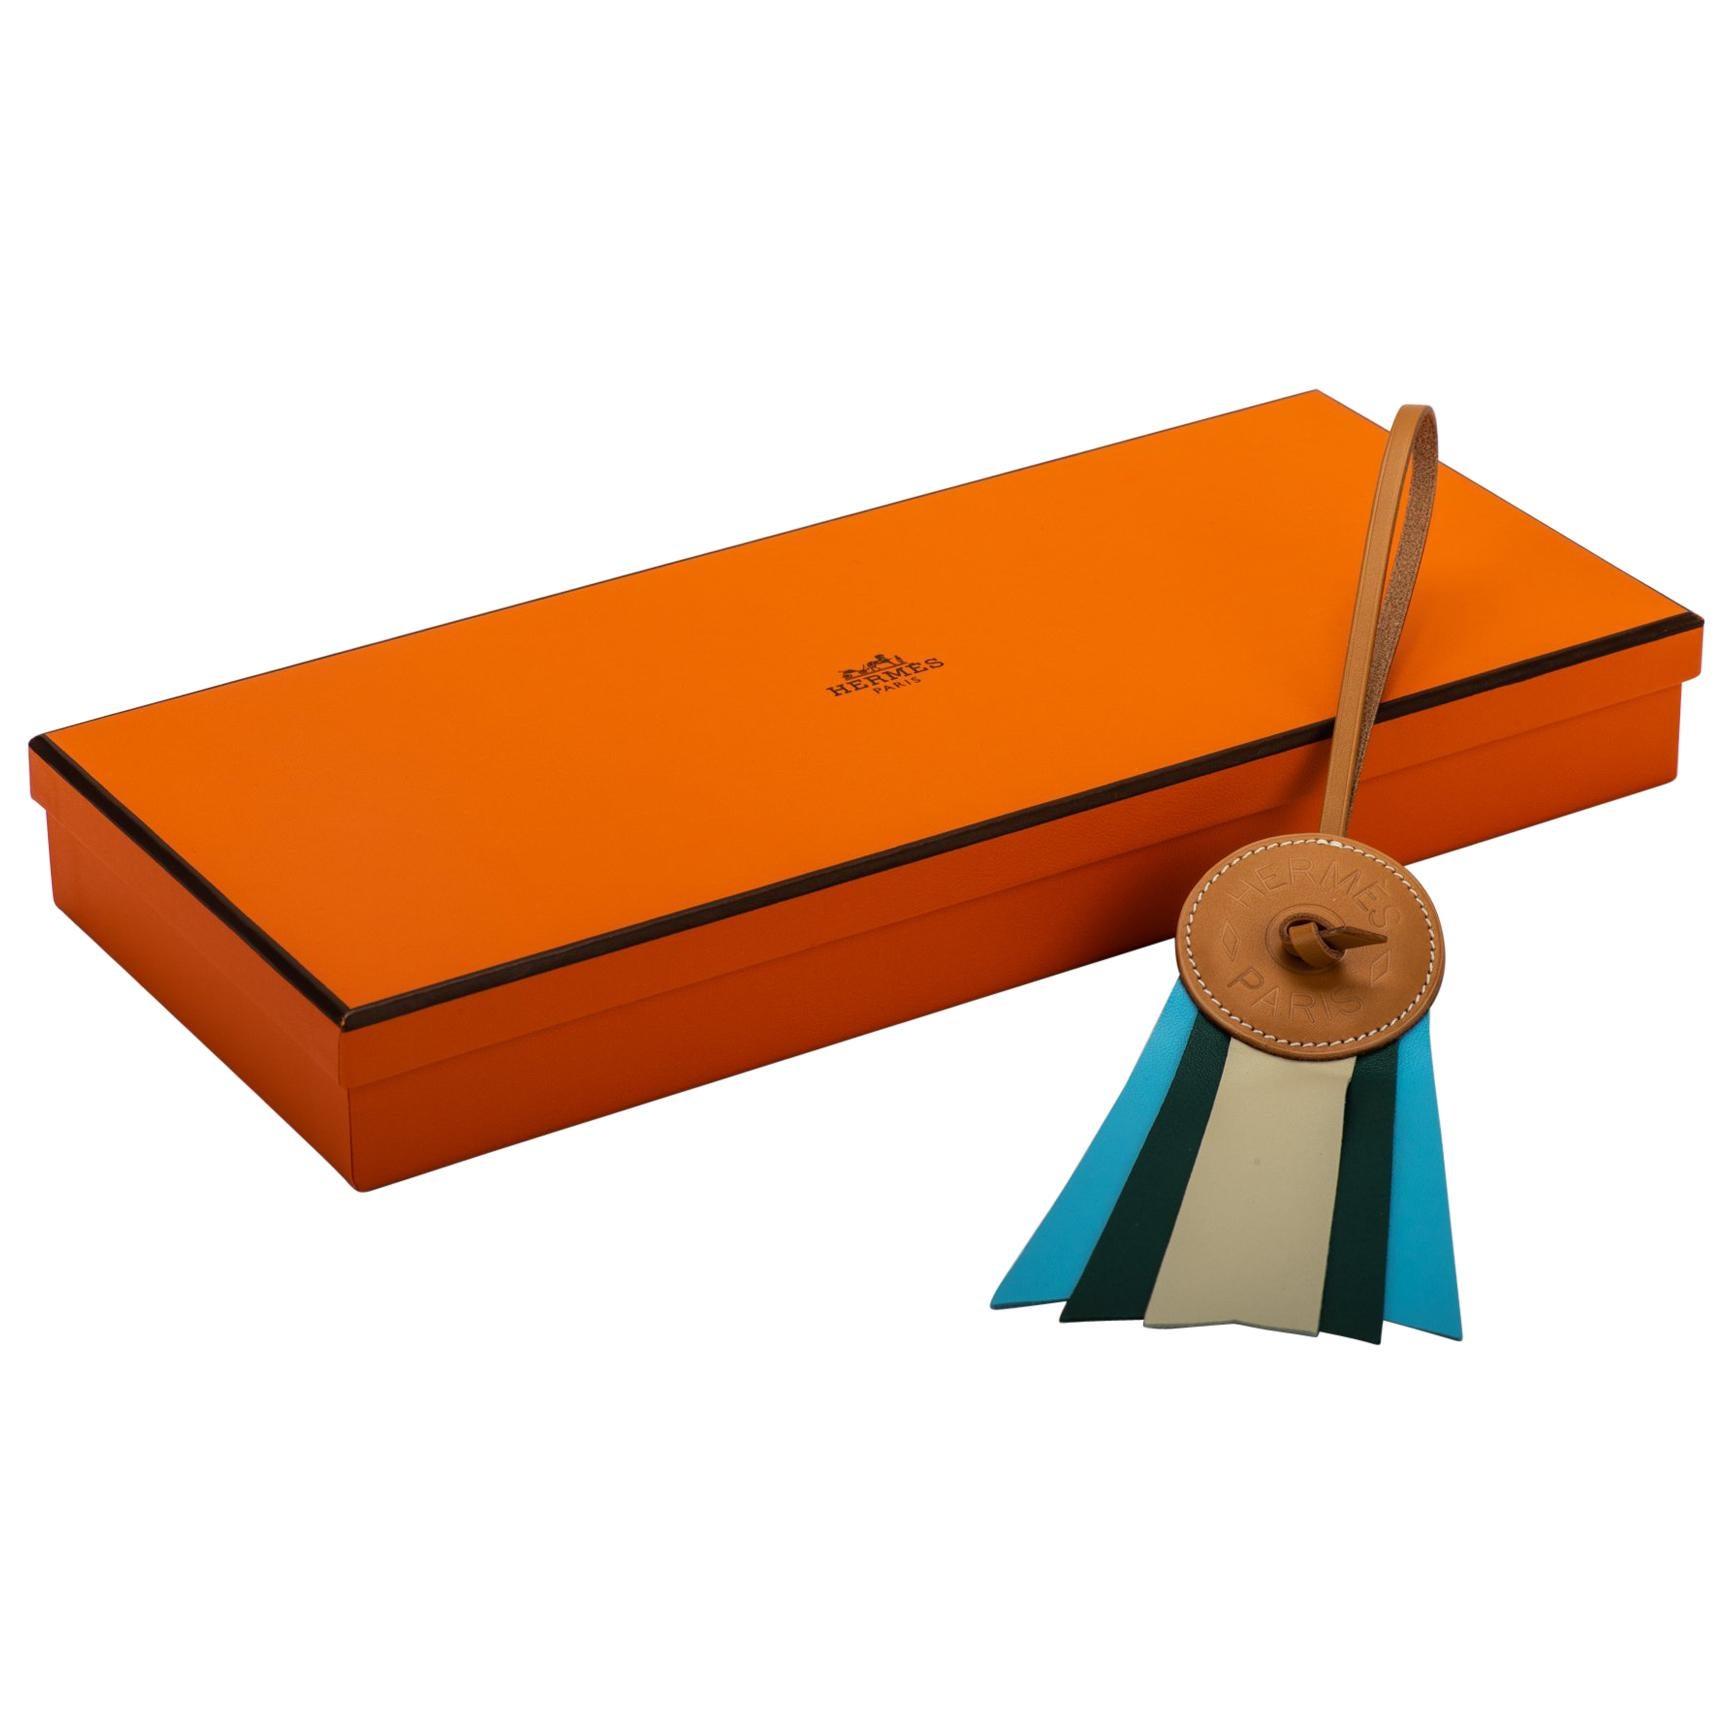 Hermes Blue Paddock Bag Charm